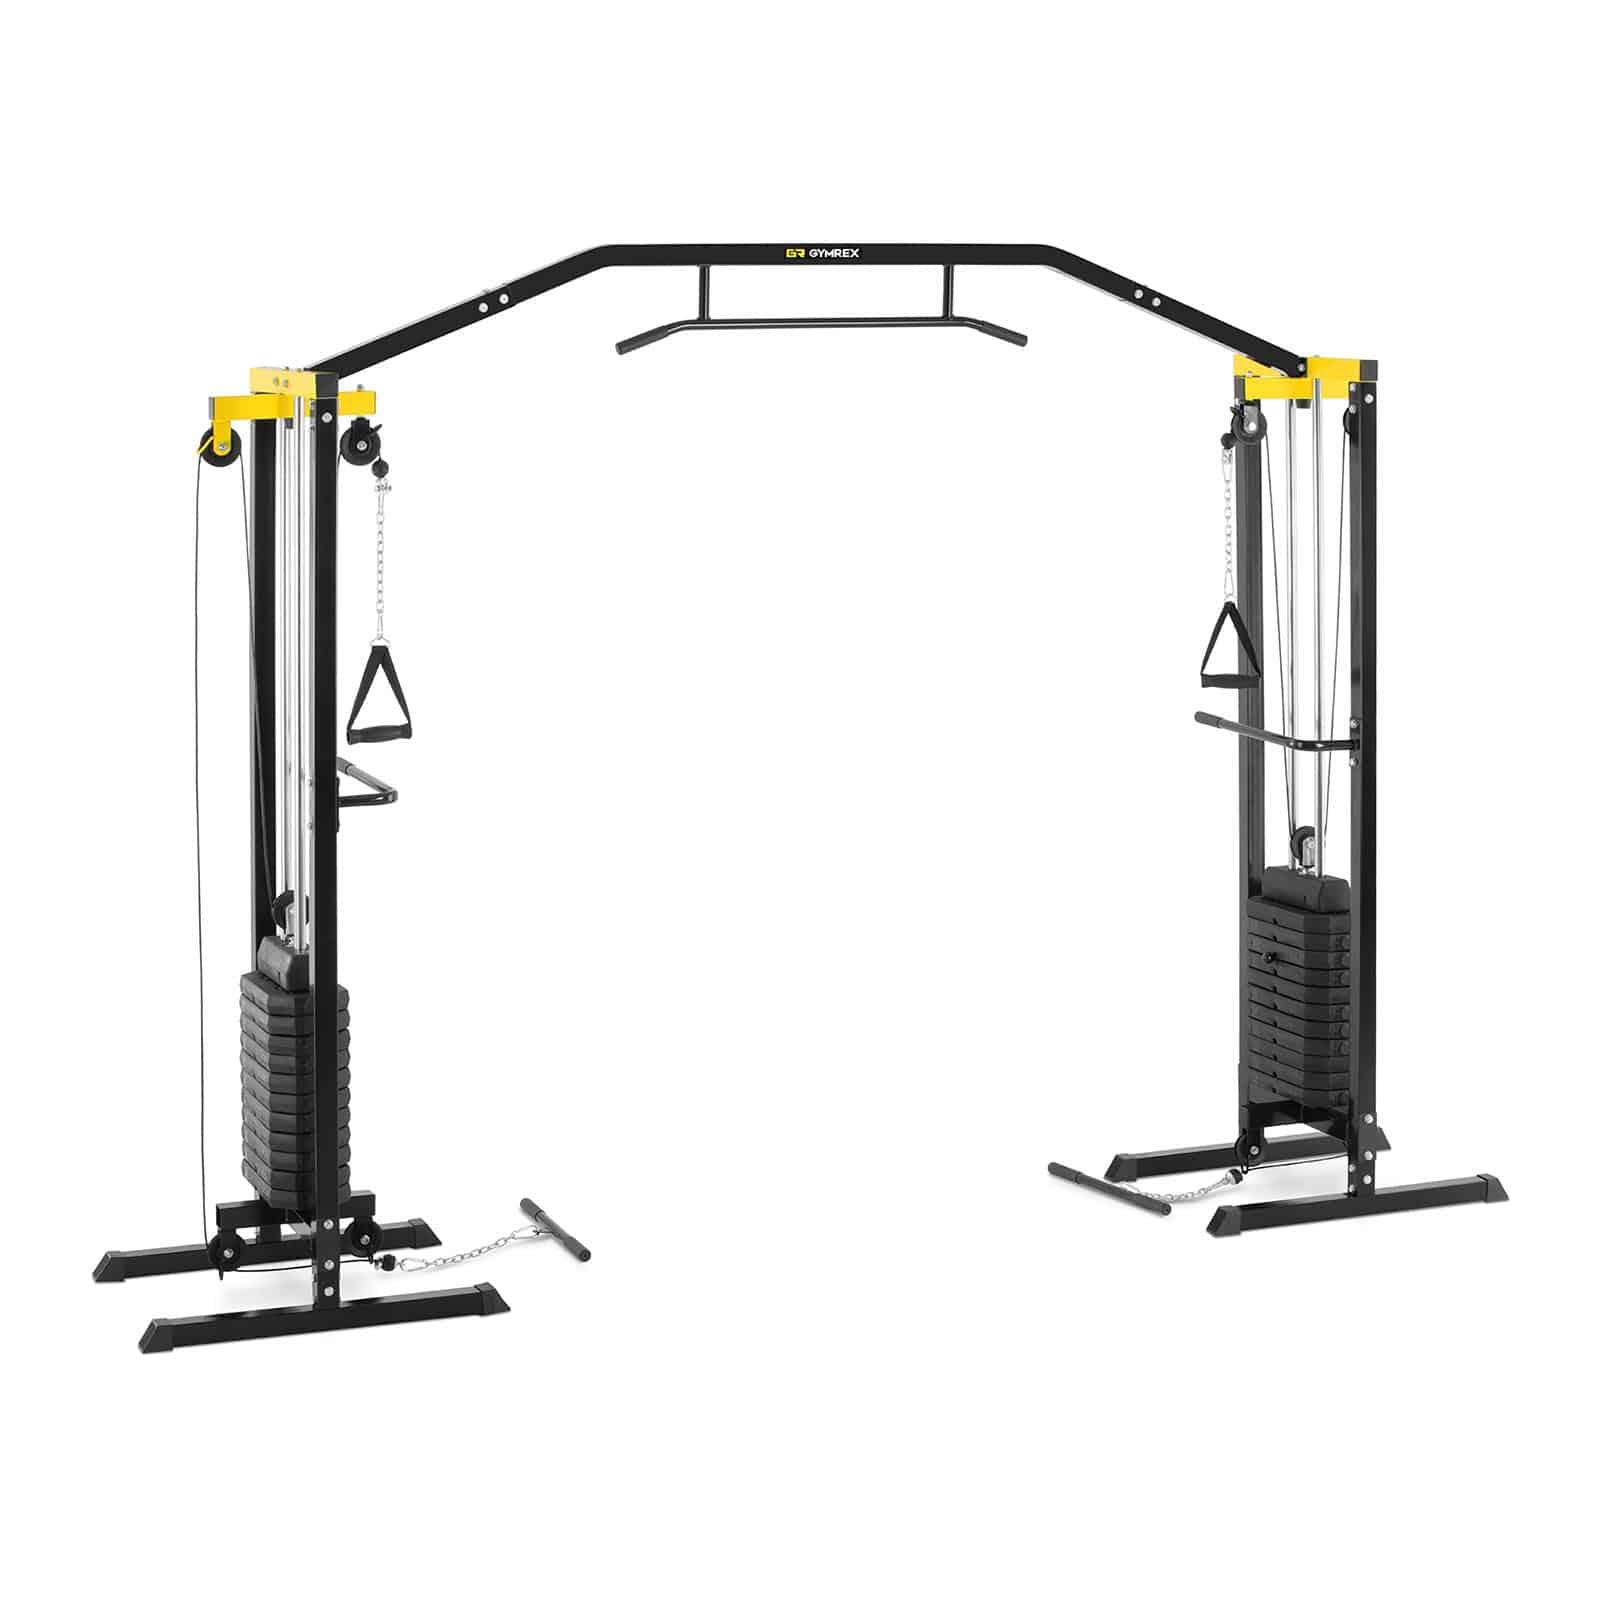 Multi-træningsstationer